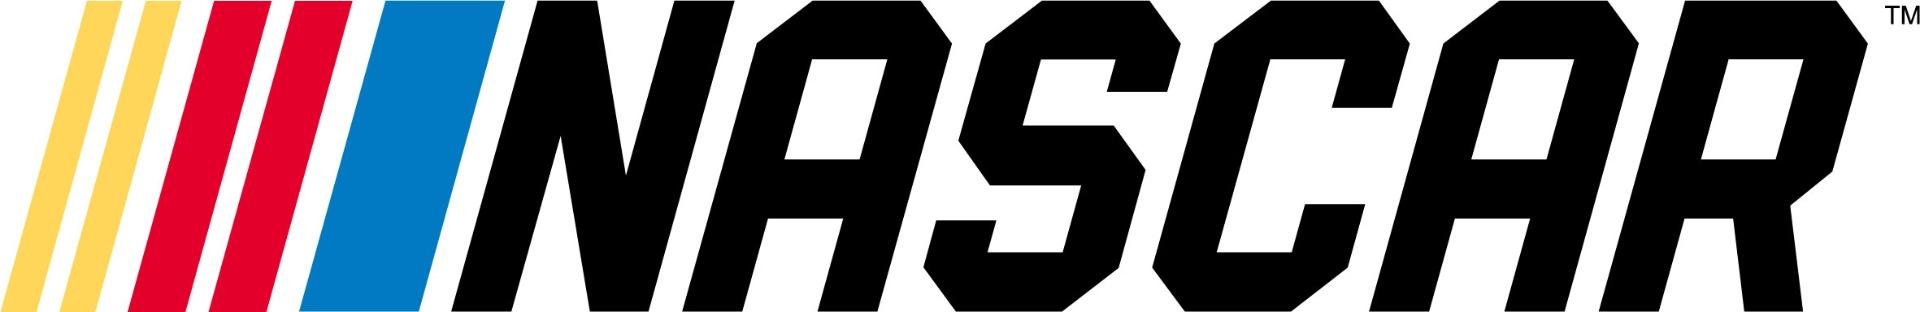 NASCAR logo for Blue-Emu Partnership